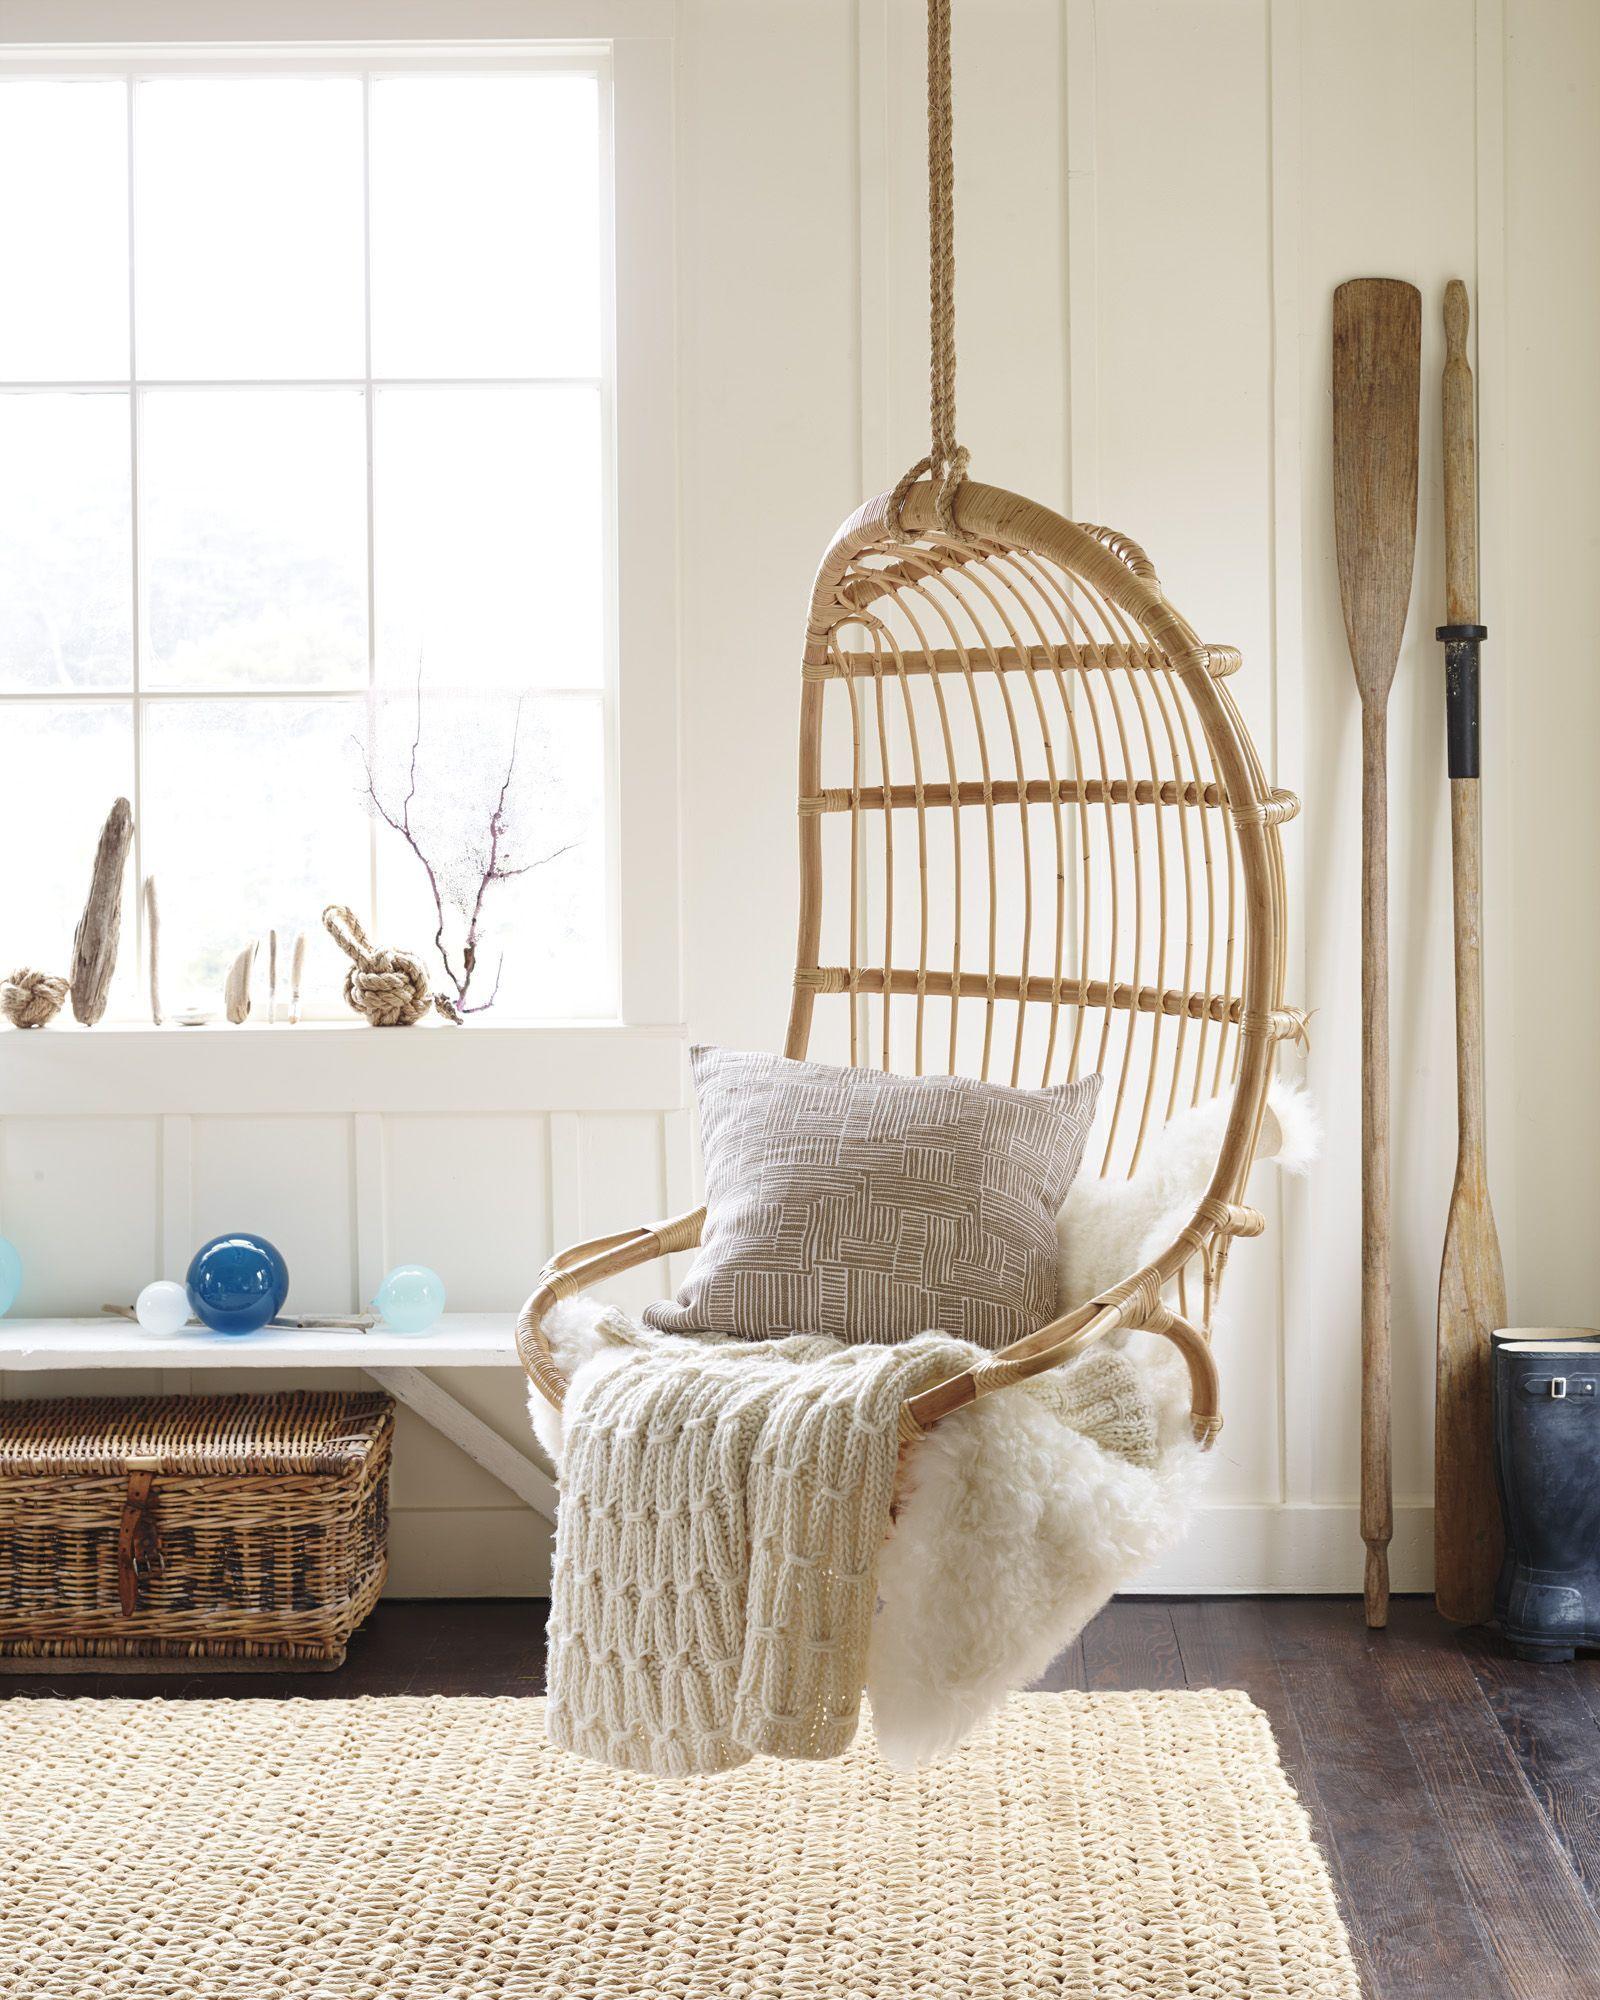 Hanging rattan chairhanging rattan chair smalllivingroomseating